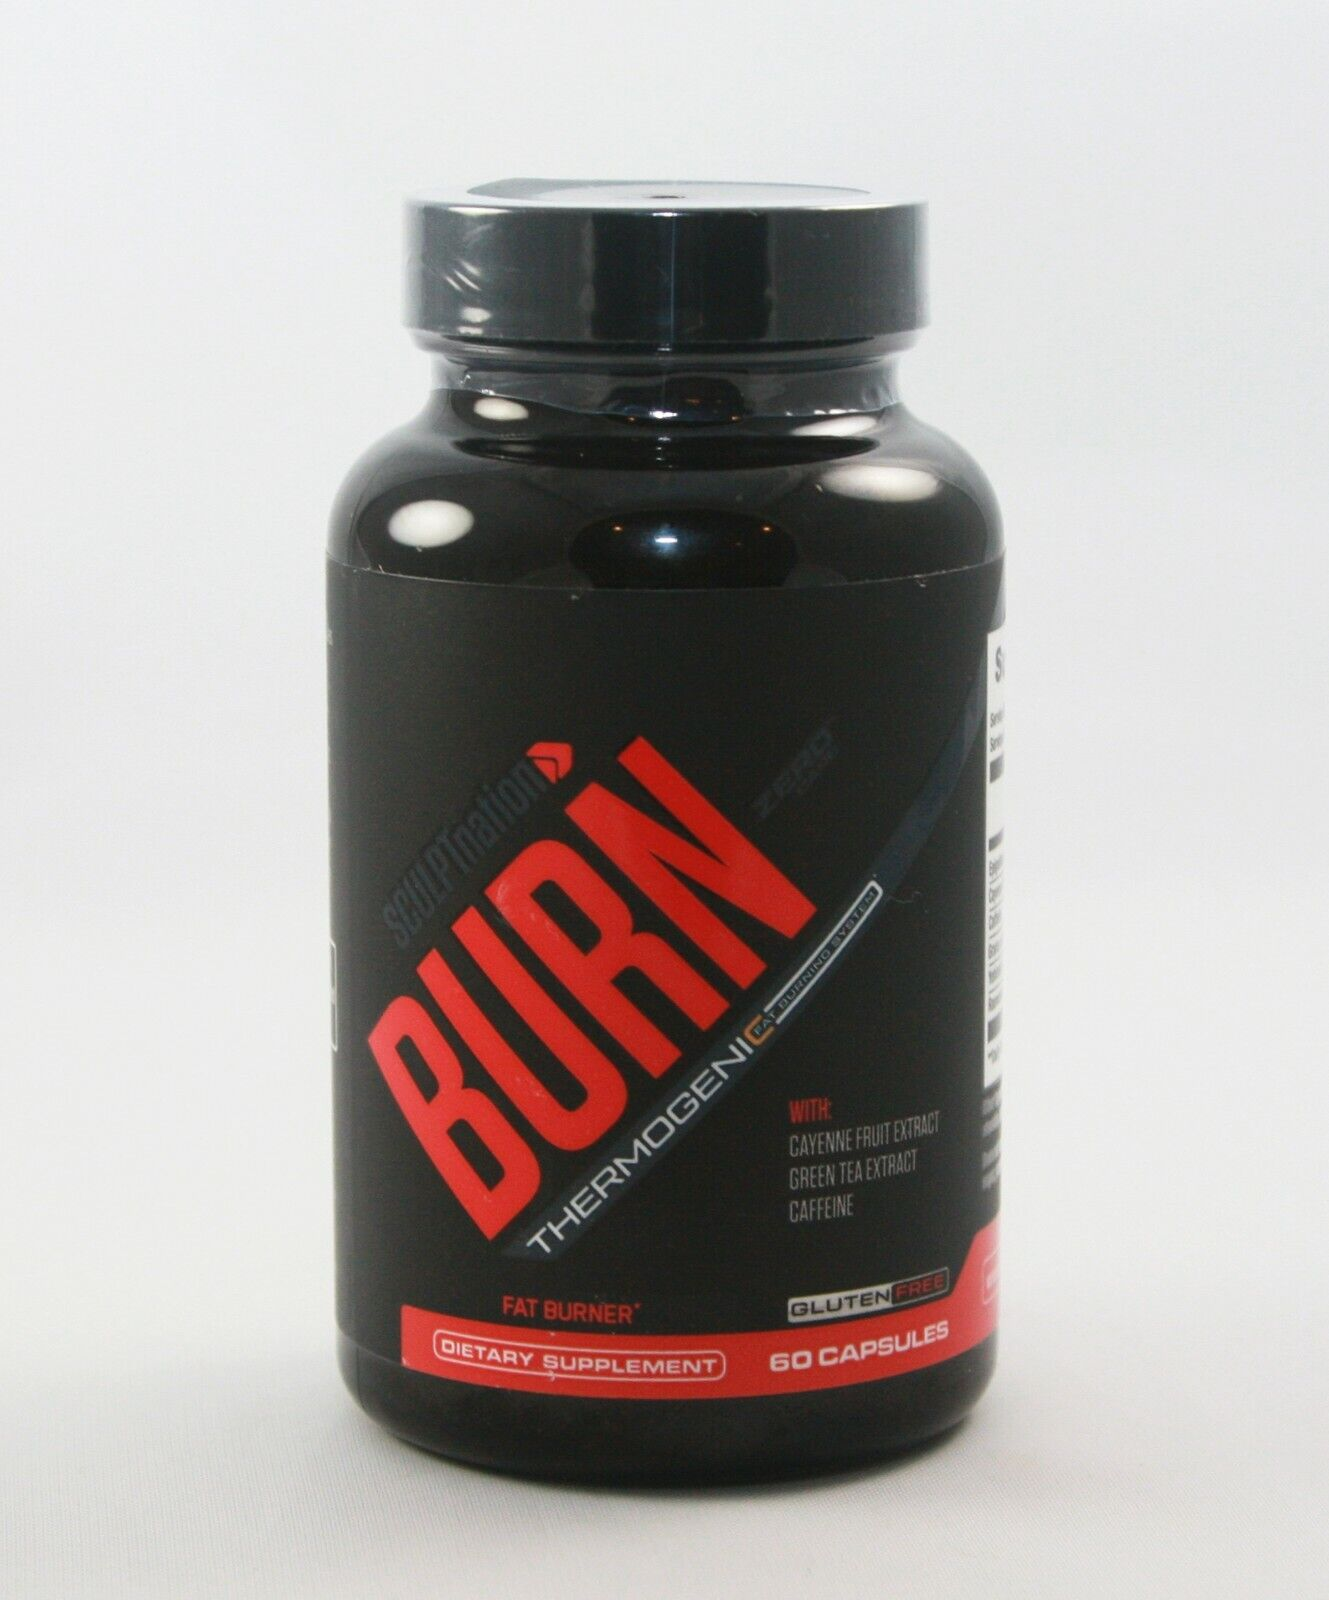 SCULPTnation BURN Thermogen Dietary Supplement 60 Capsules